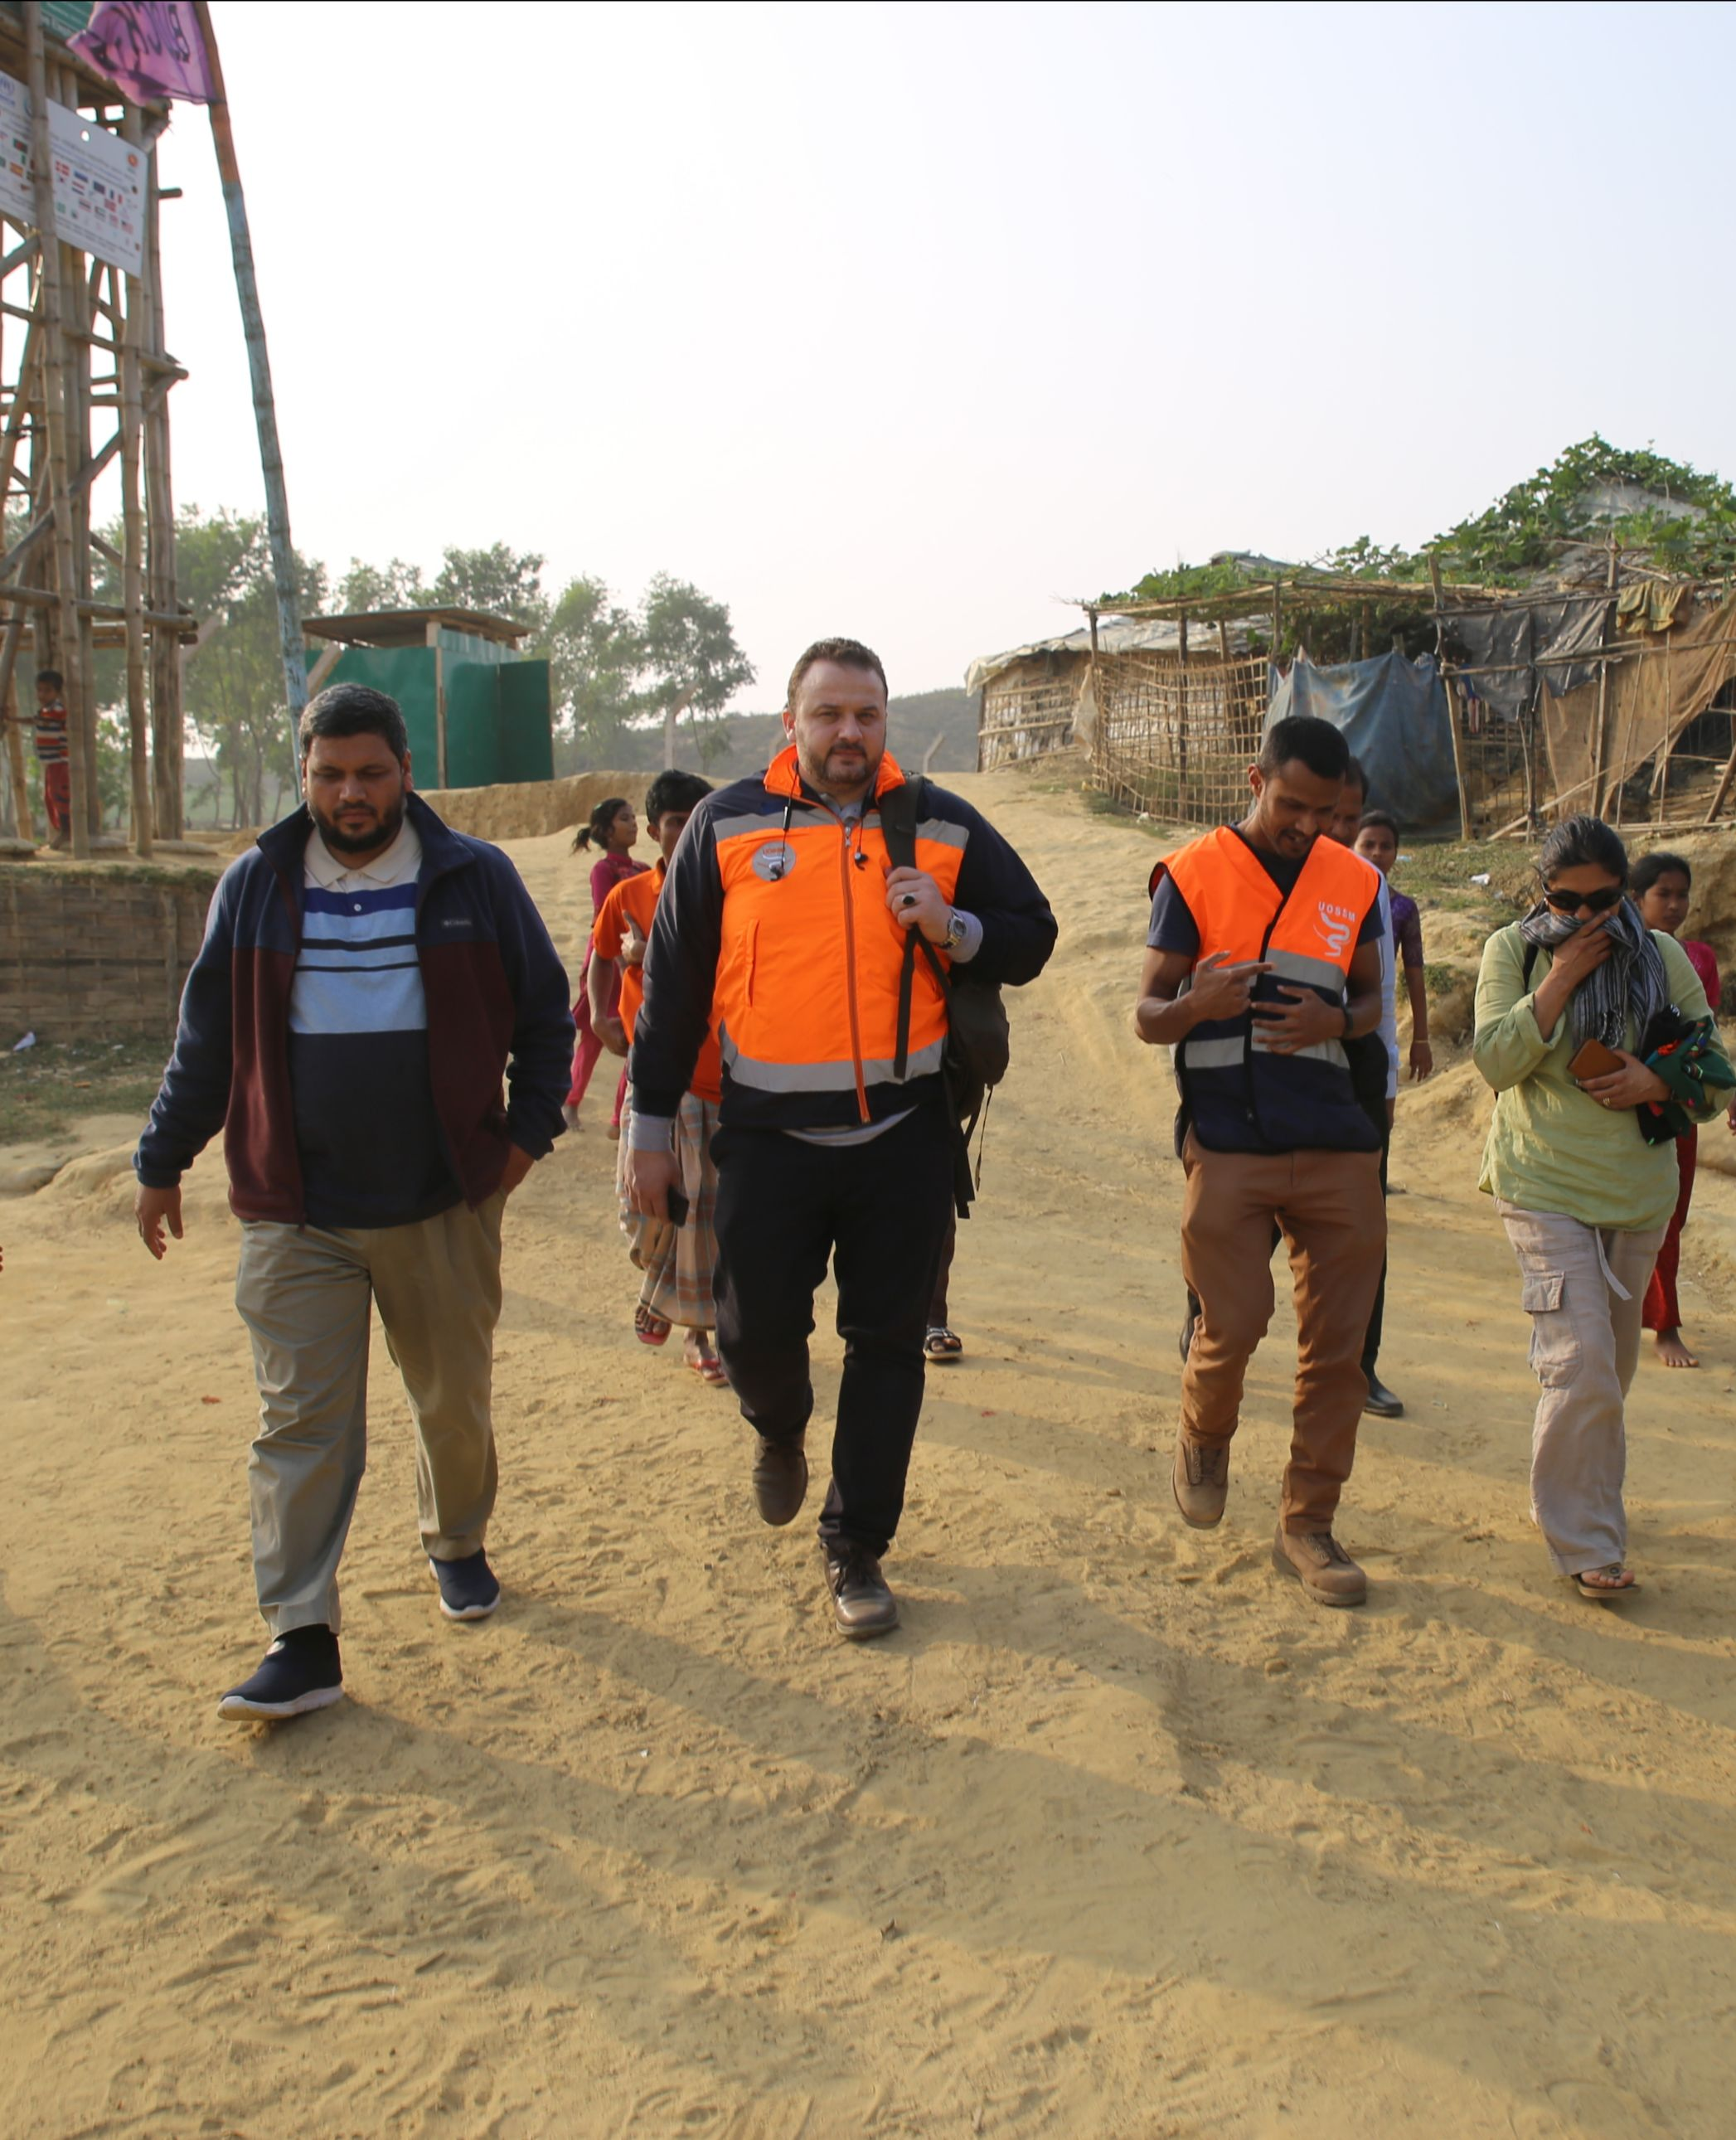 UOSSM Representative meets in Bangladesh to explore future medical projects